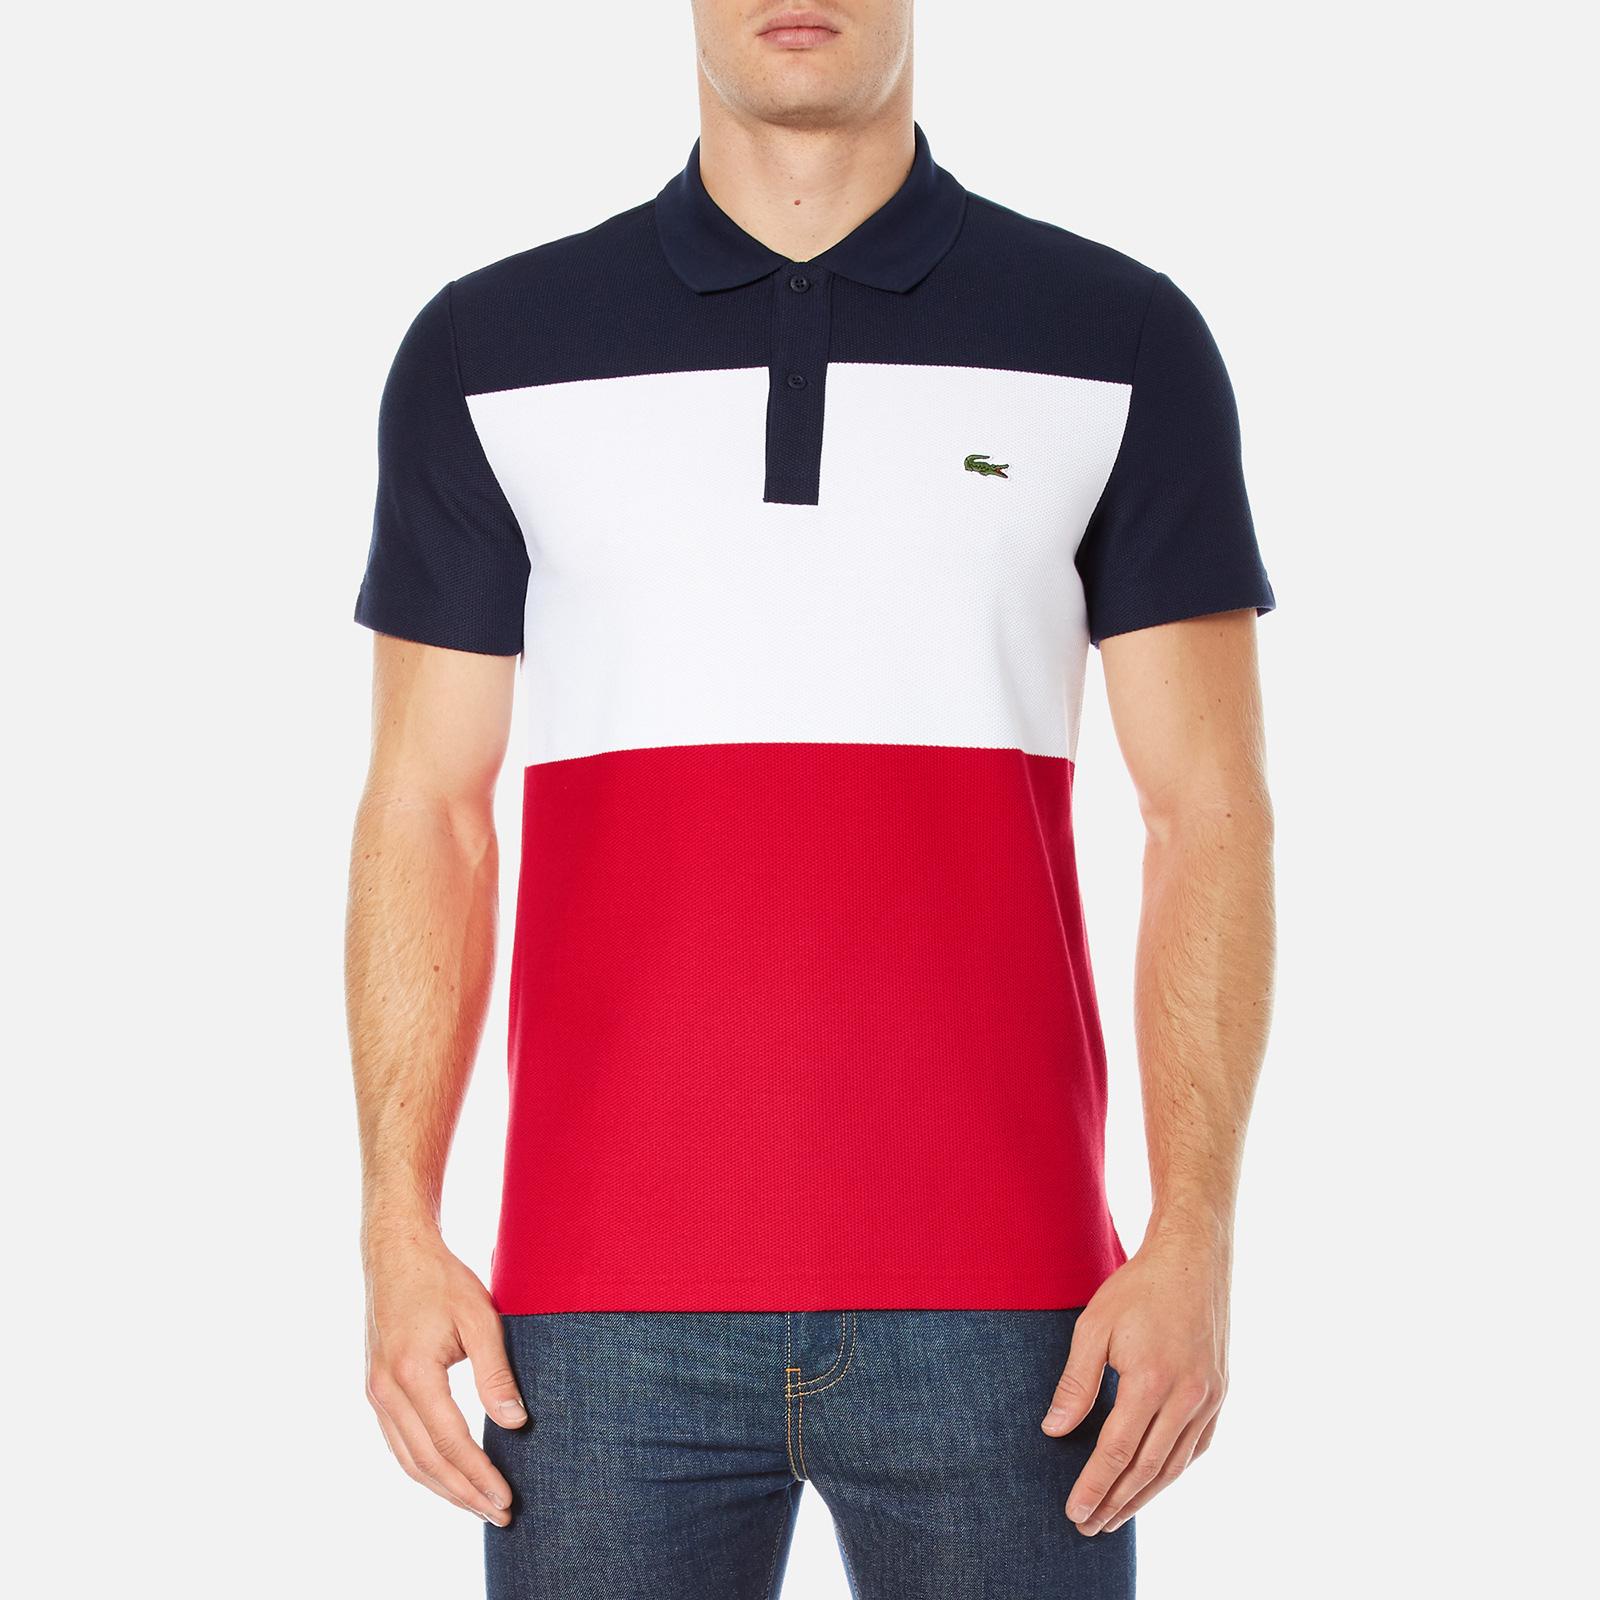 bf0a8e4cedf new zealand lacoste mens short sleeve bold stripe polo shirt navy blue white  a8869 0b0eb